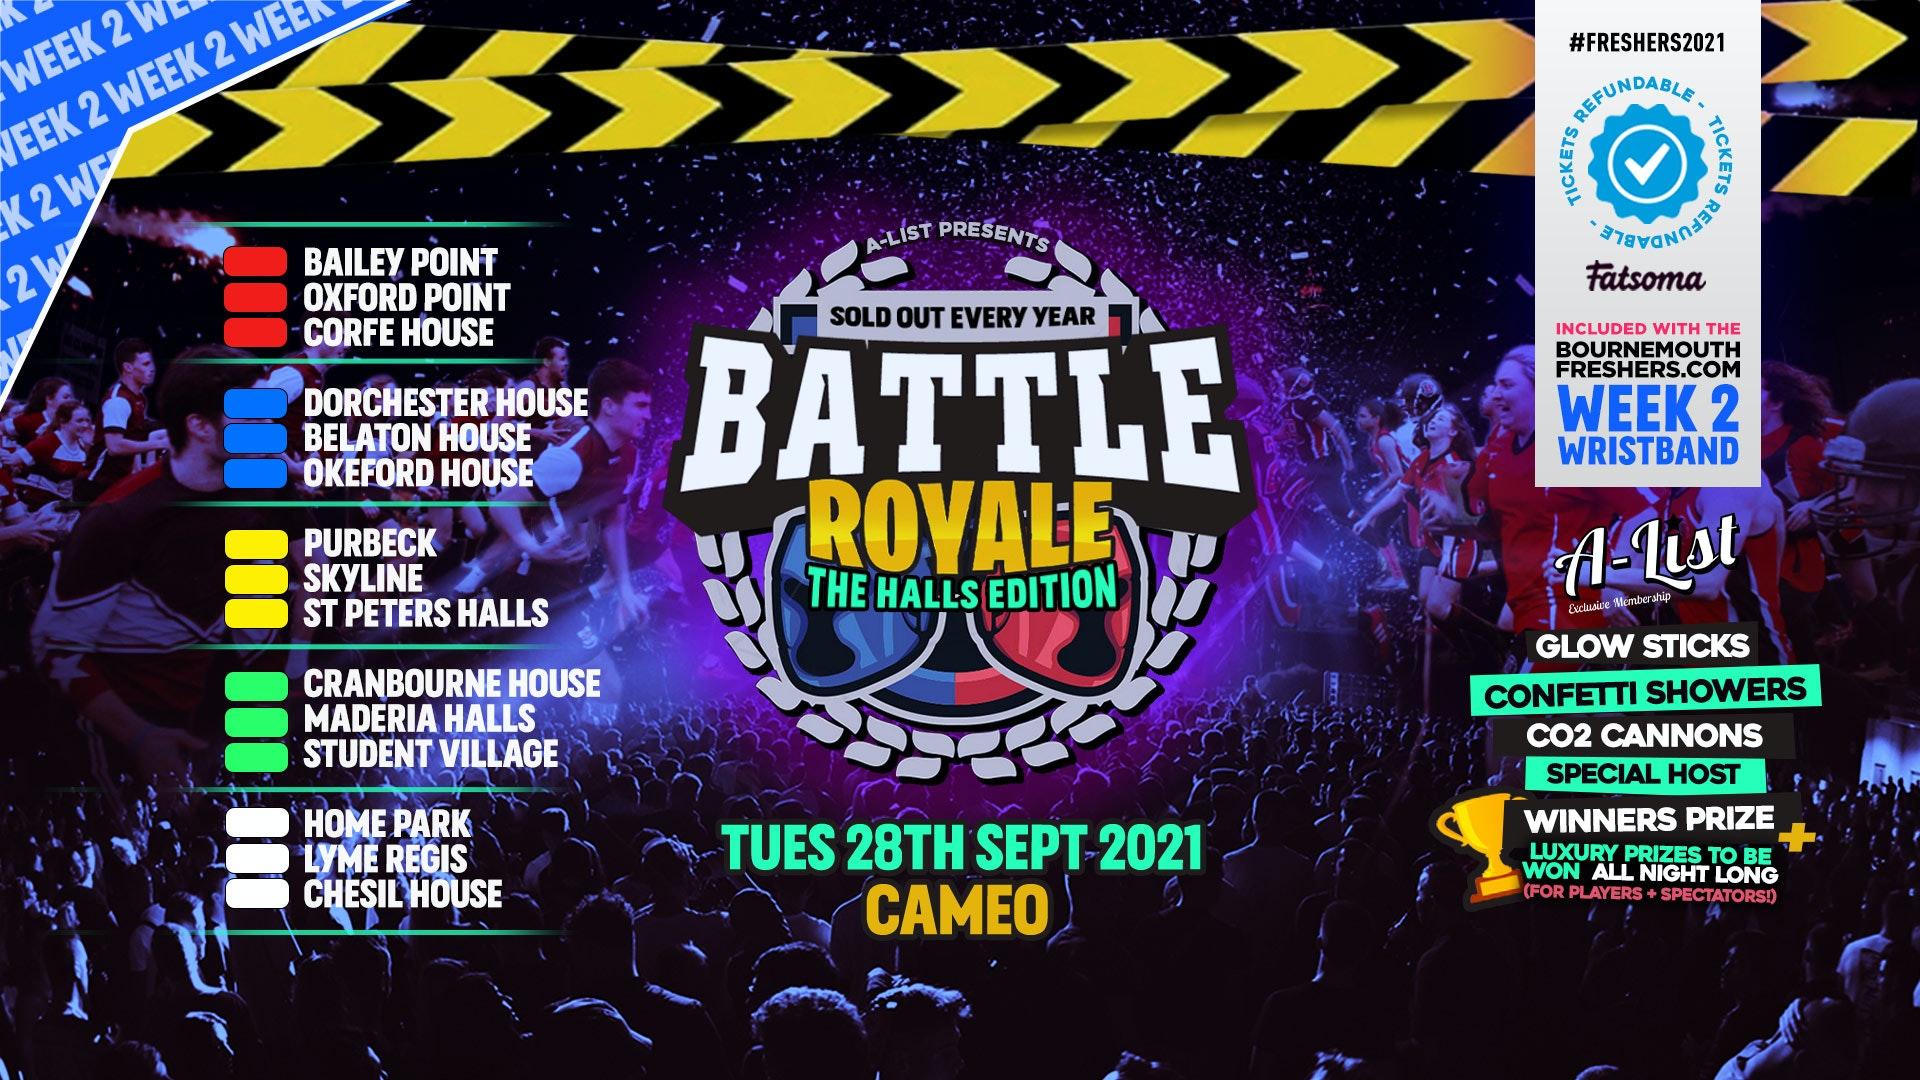 Battle Royale – Battle of the Halls @ Cameo | Bournemouth Freshers 2021  [Week 2 Freshers Event]